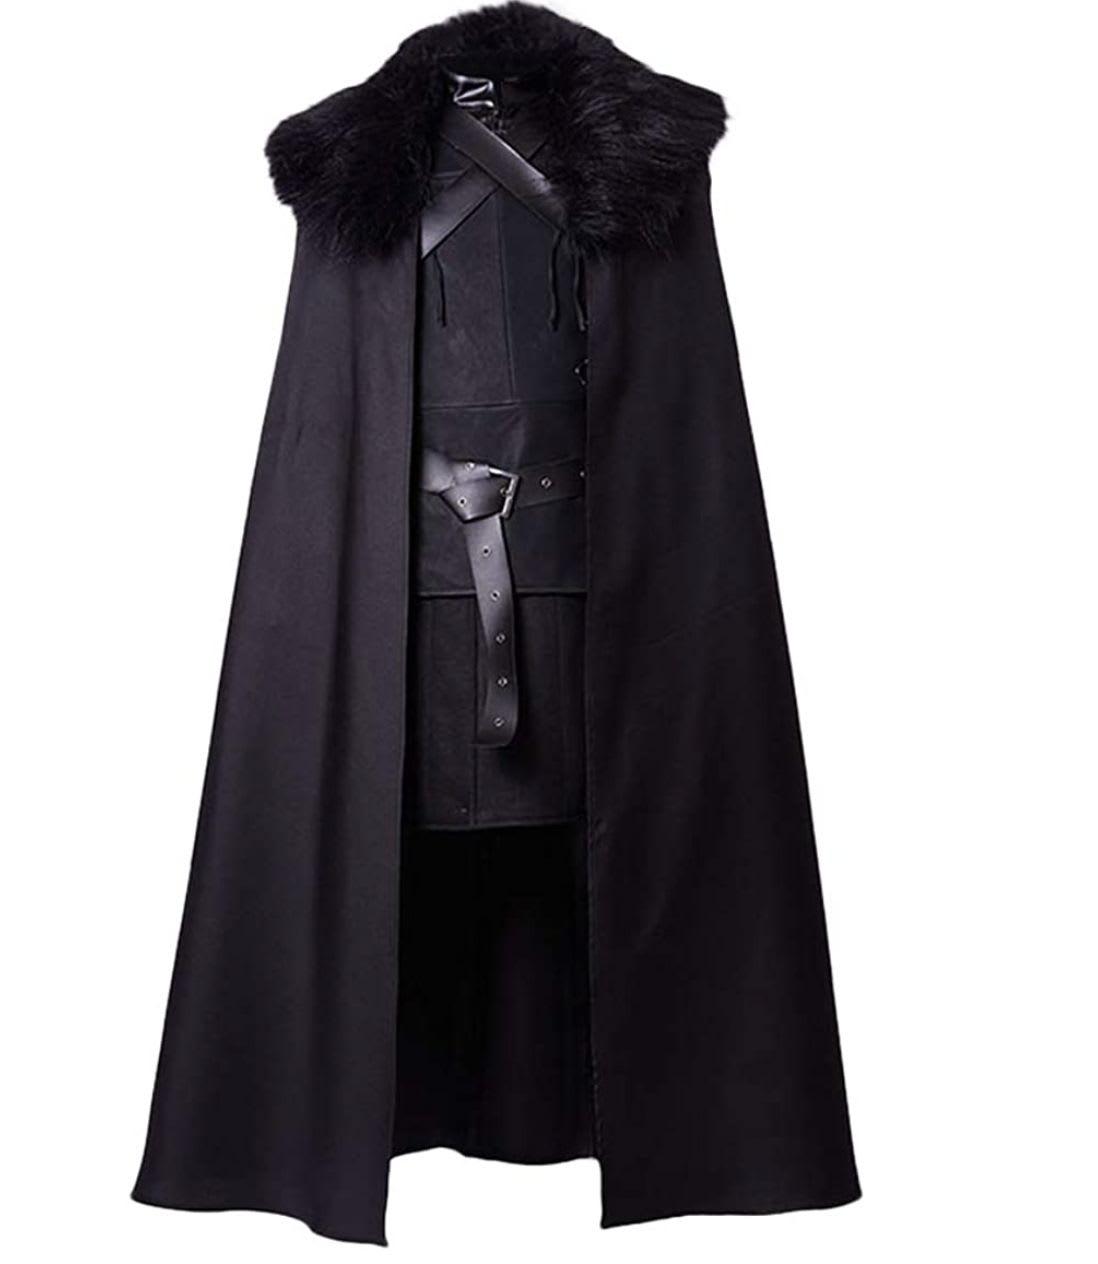 Discover SIDNOR's Jon Snow costume on Amazon.